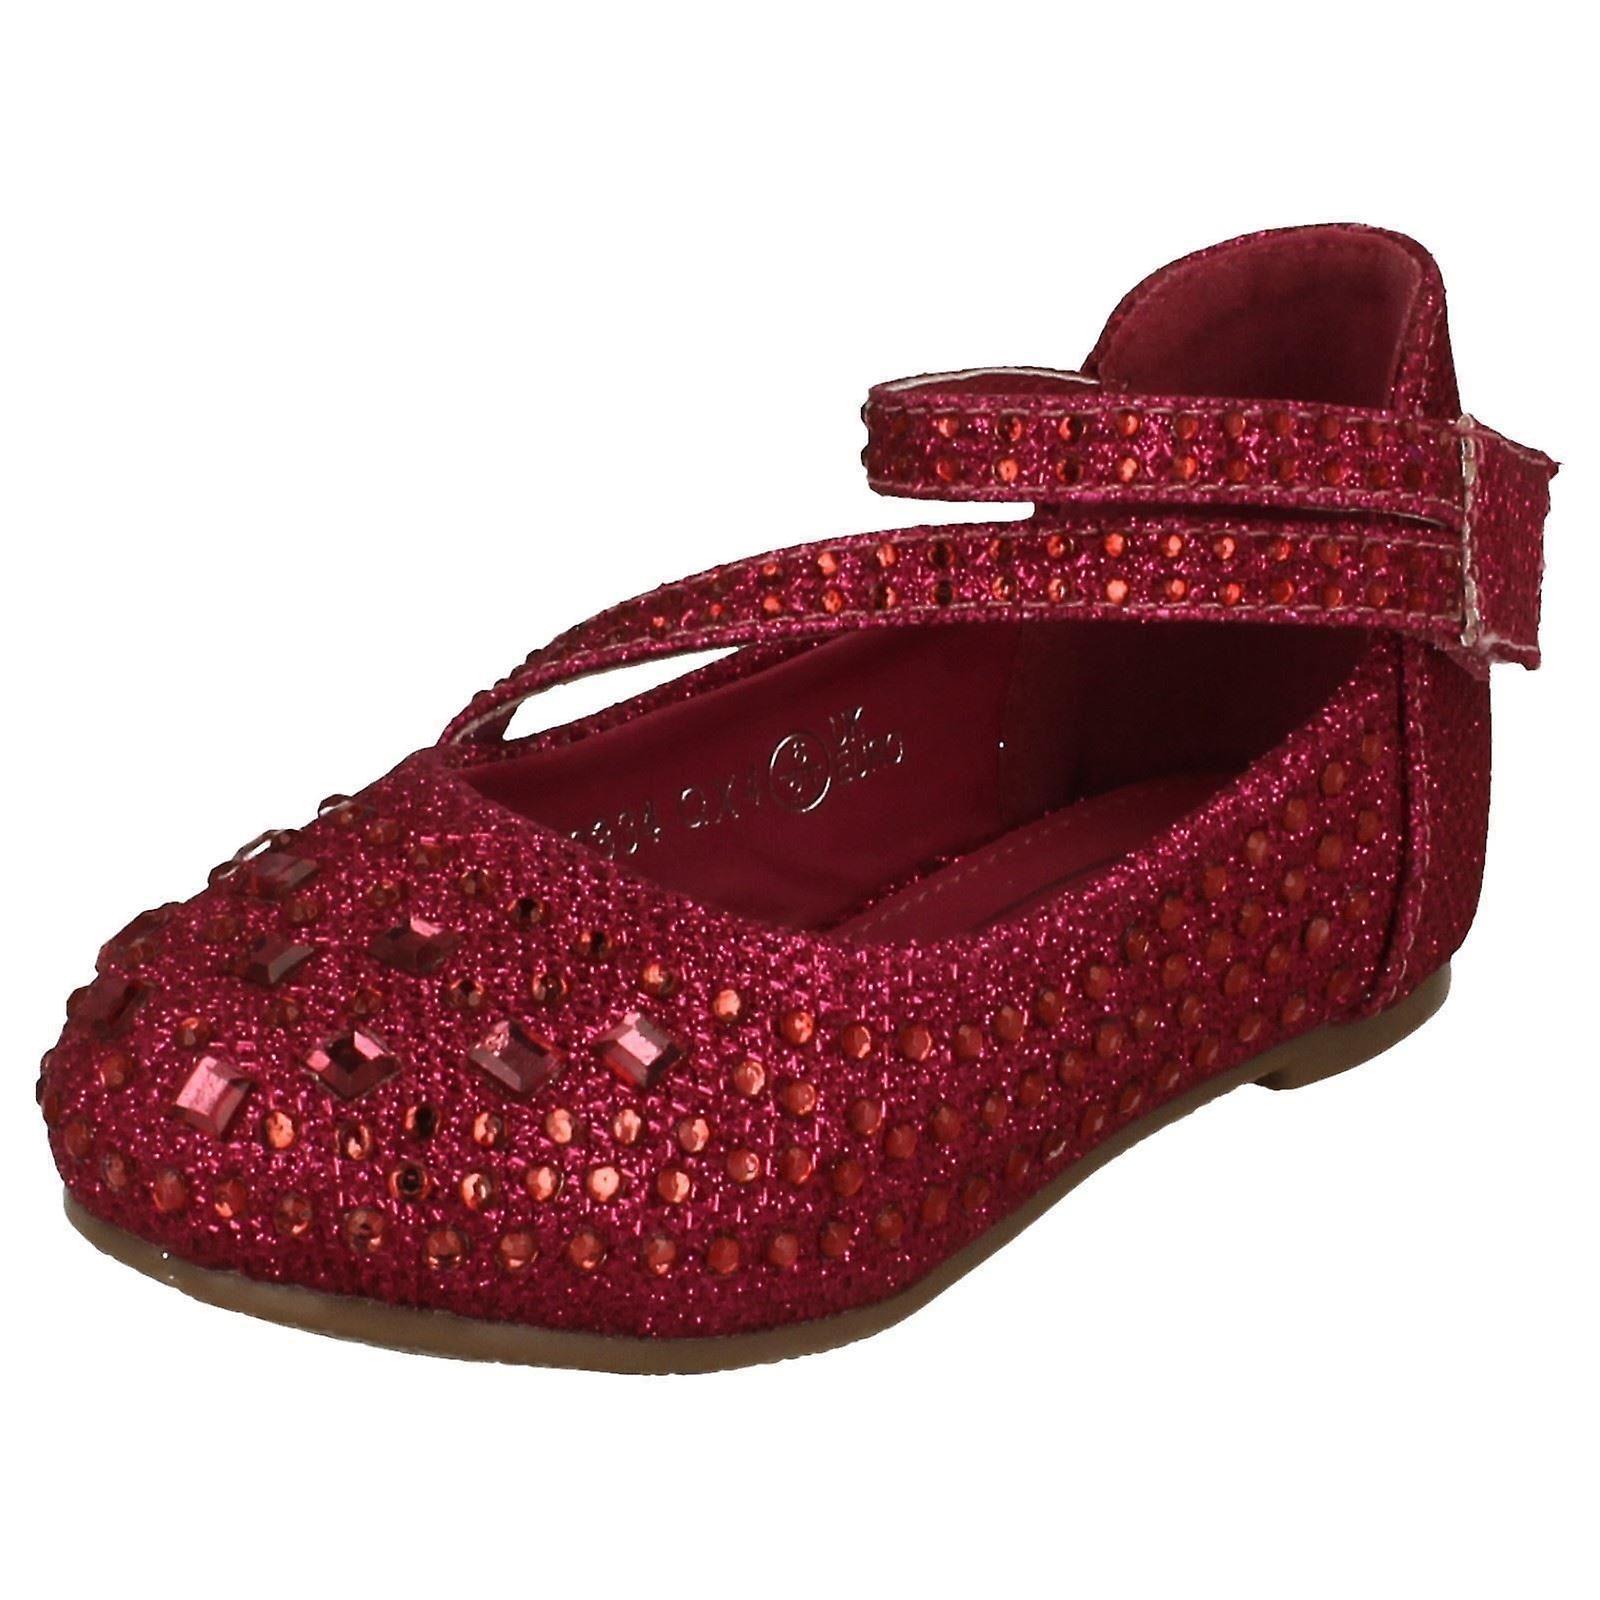 Gils Fleck auf Glitter Party Schuhe